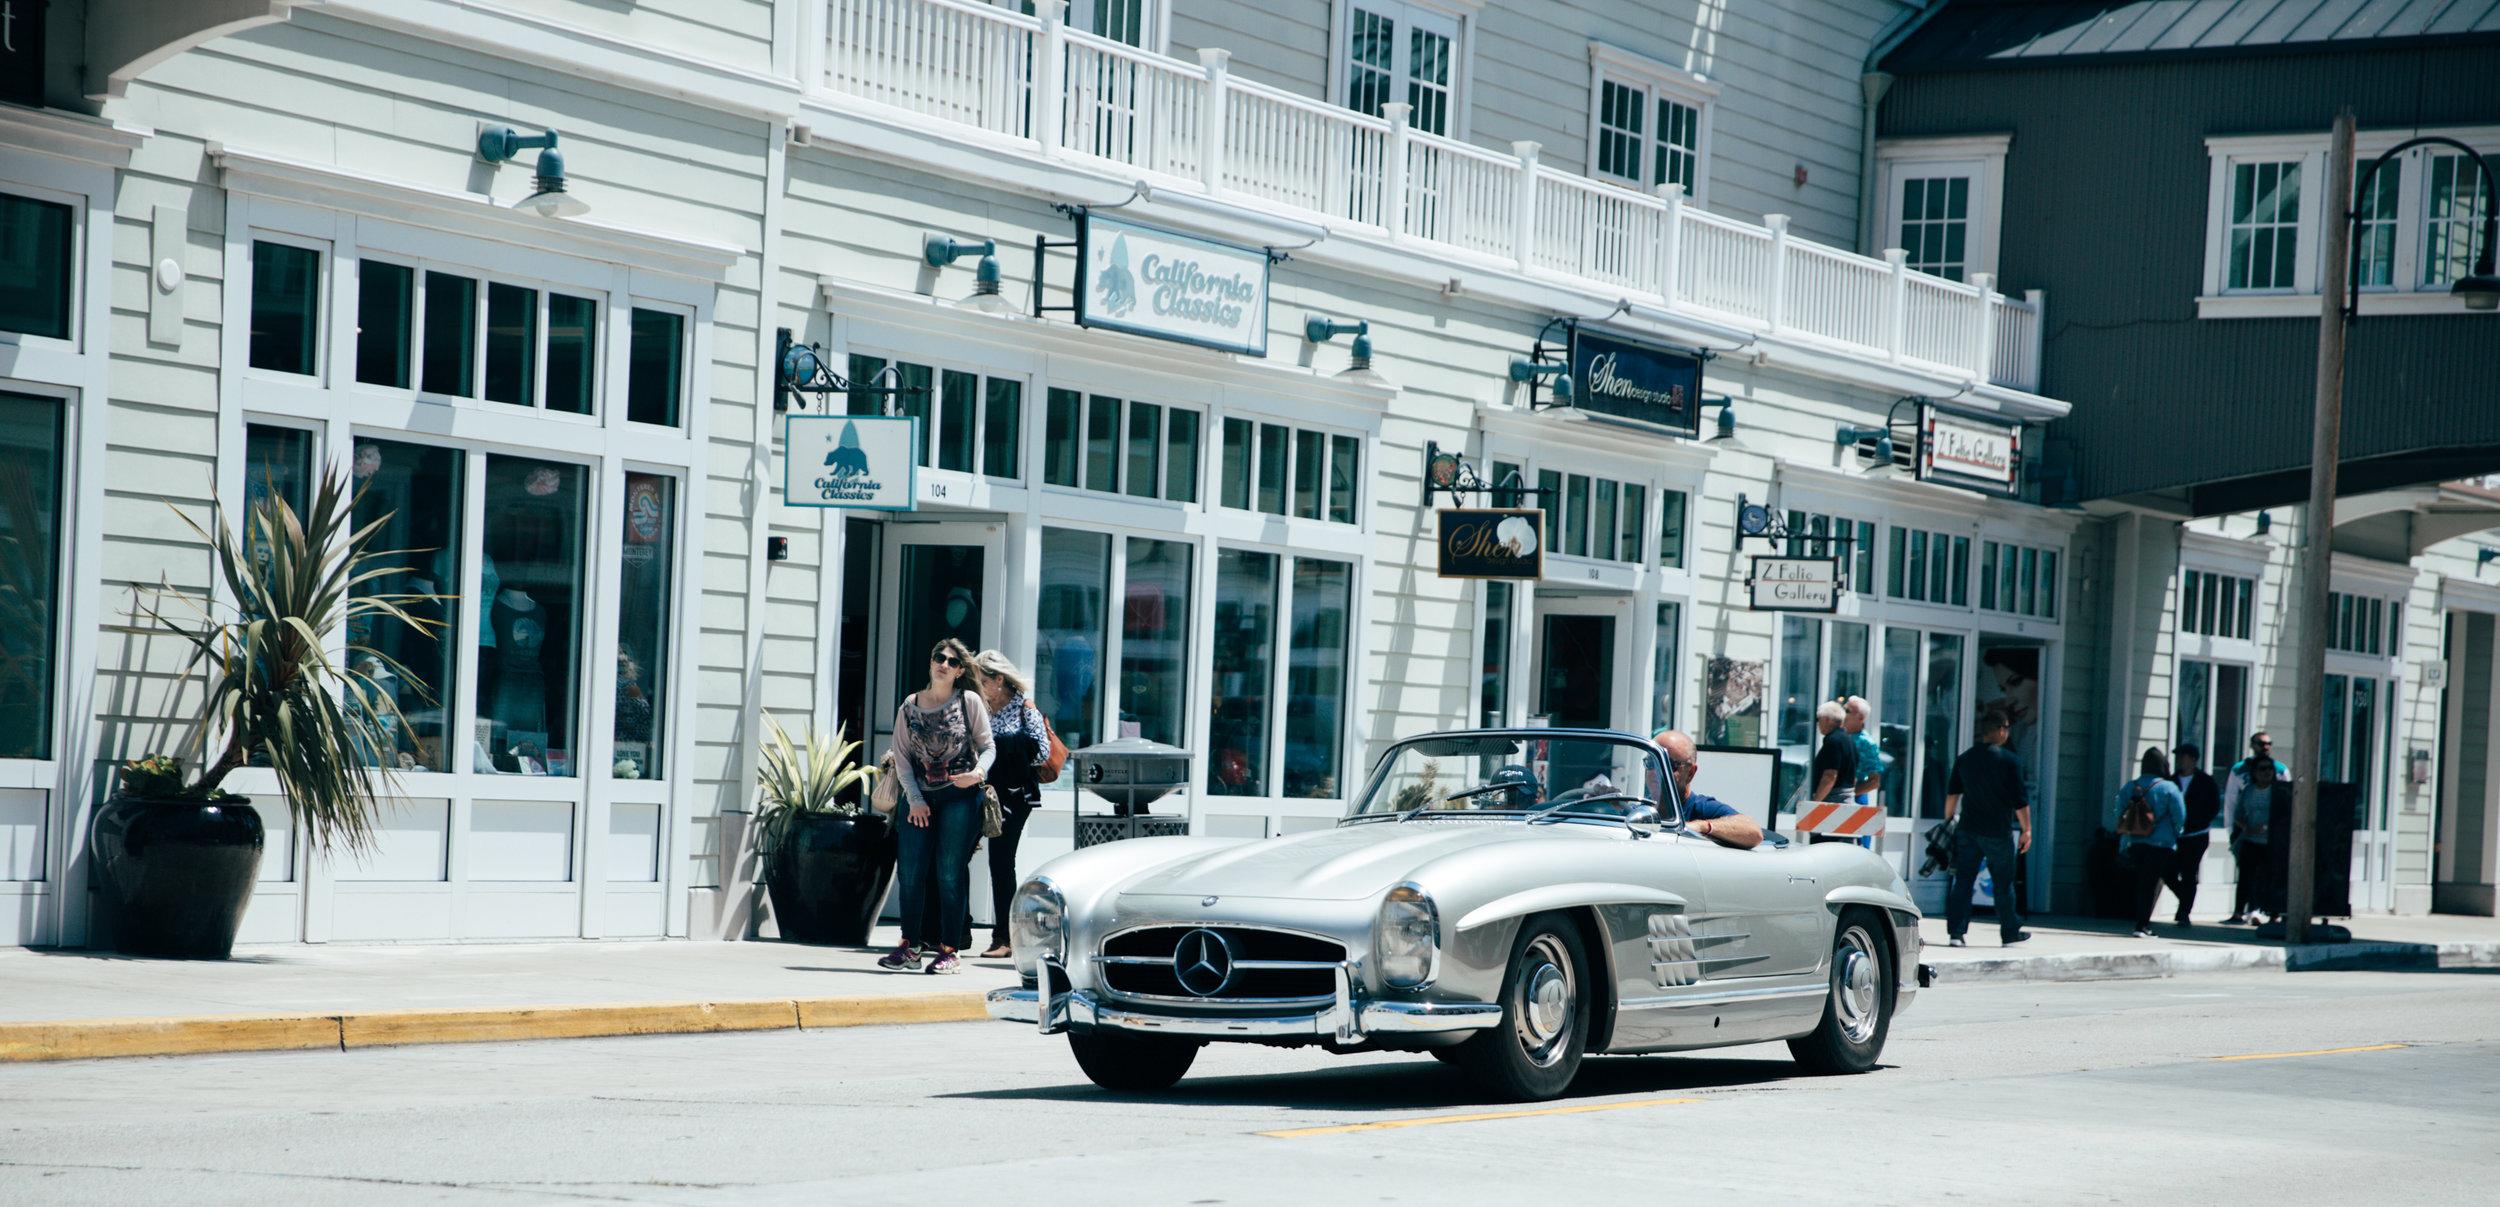 Stay_Driven_Monterey_Car_Week_4-3.jpg